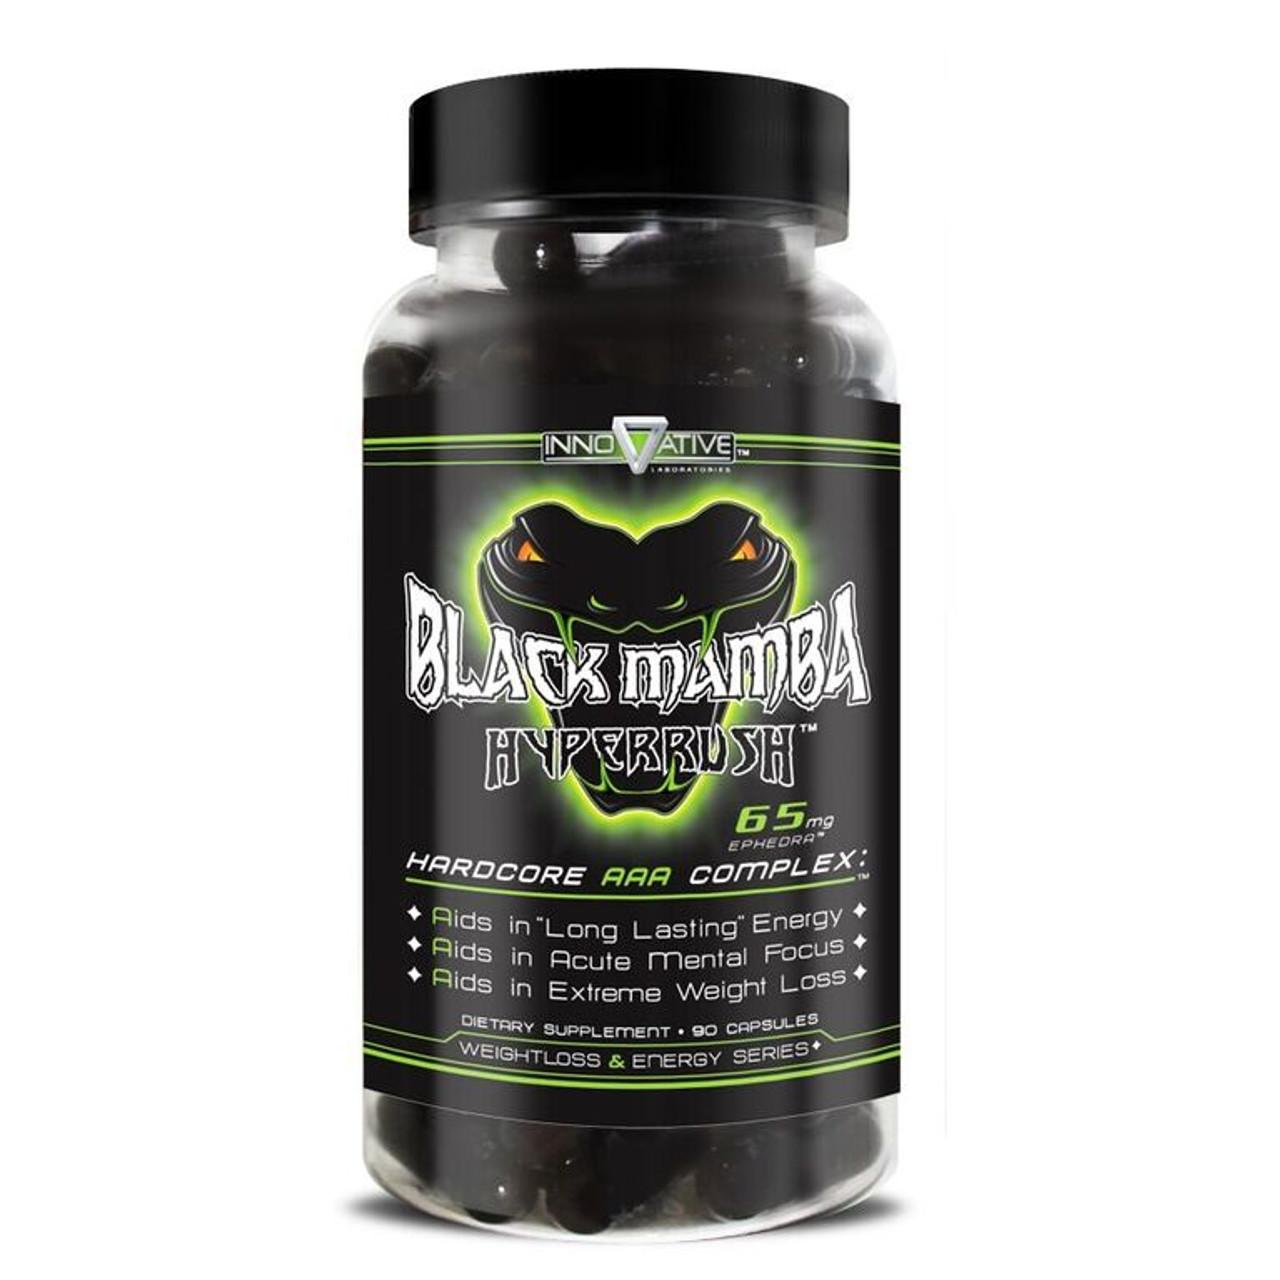 Black Mamba Hyperrush 90ct Innovative Laboratories